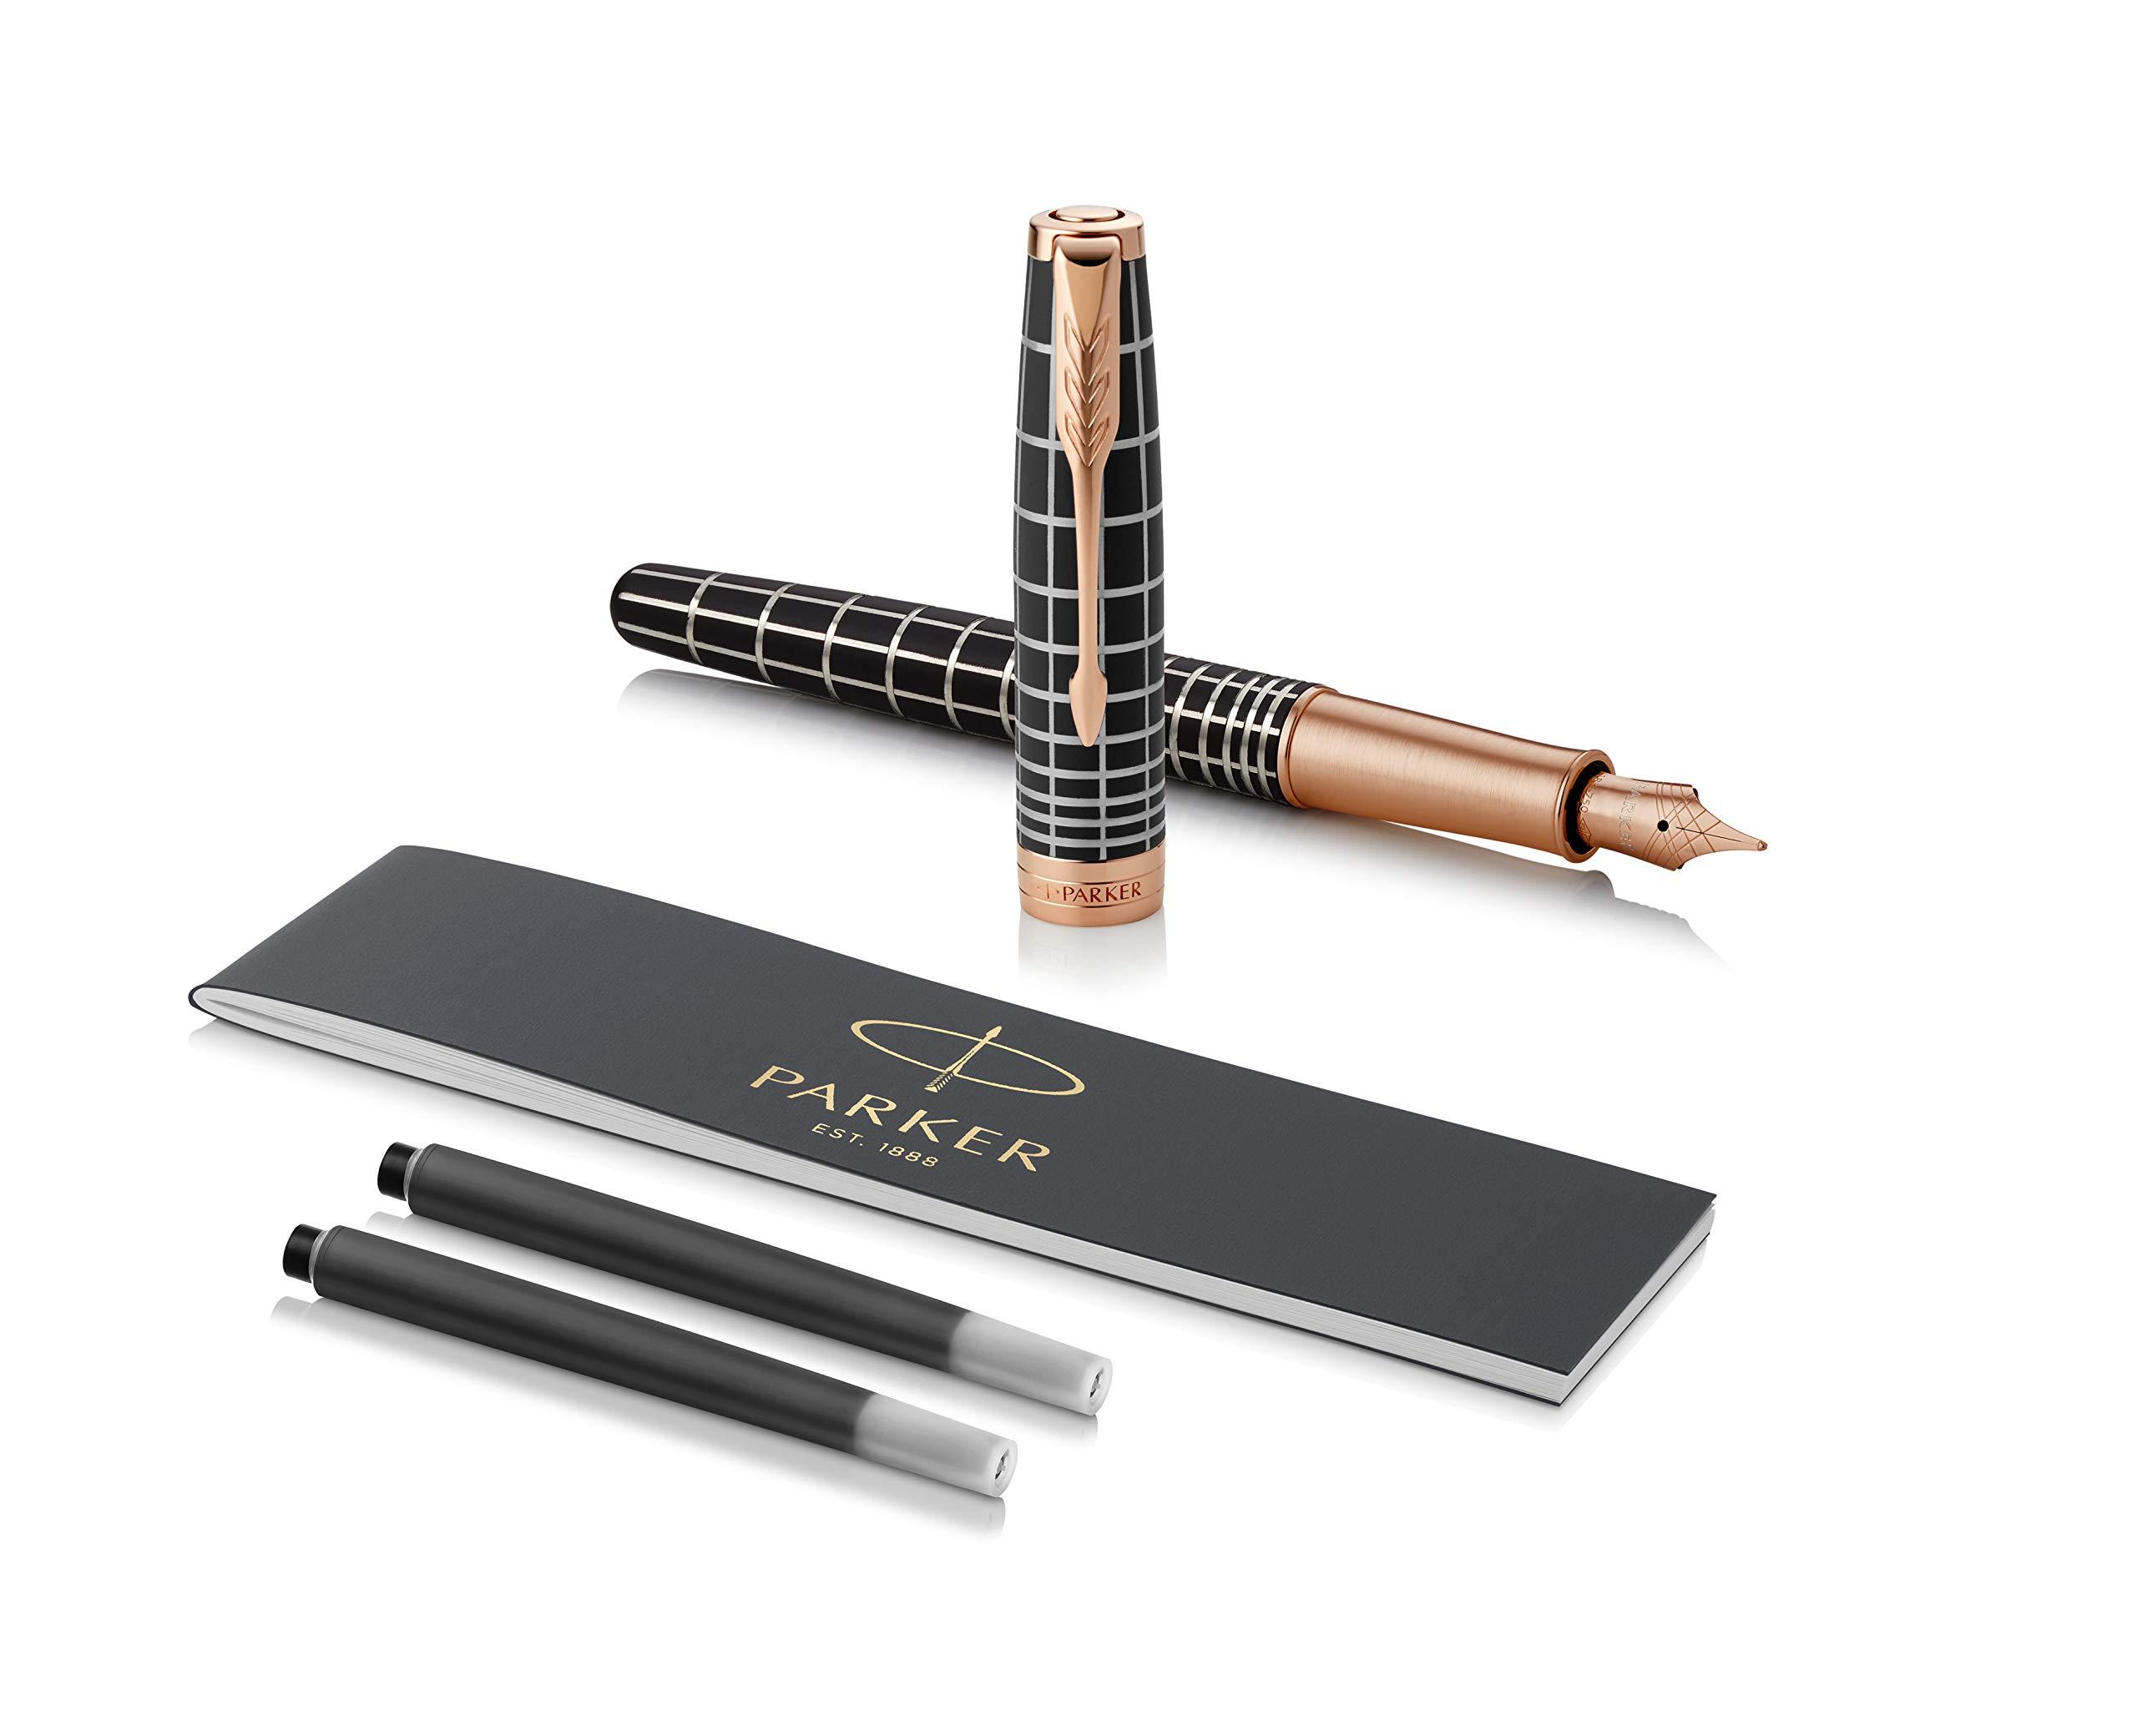 PARKER Sonnet Fountain Pen, Prestige Brown Rubber with Rose Gold Trim, Solid 18k Gold Fine Nib